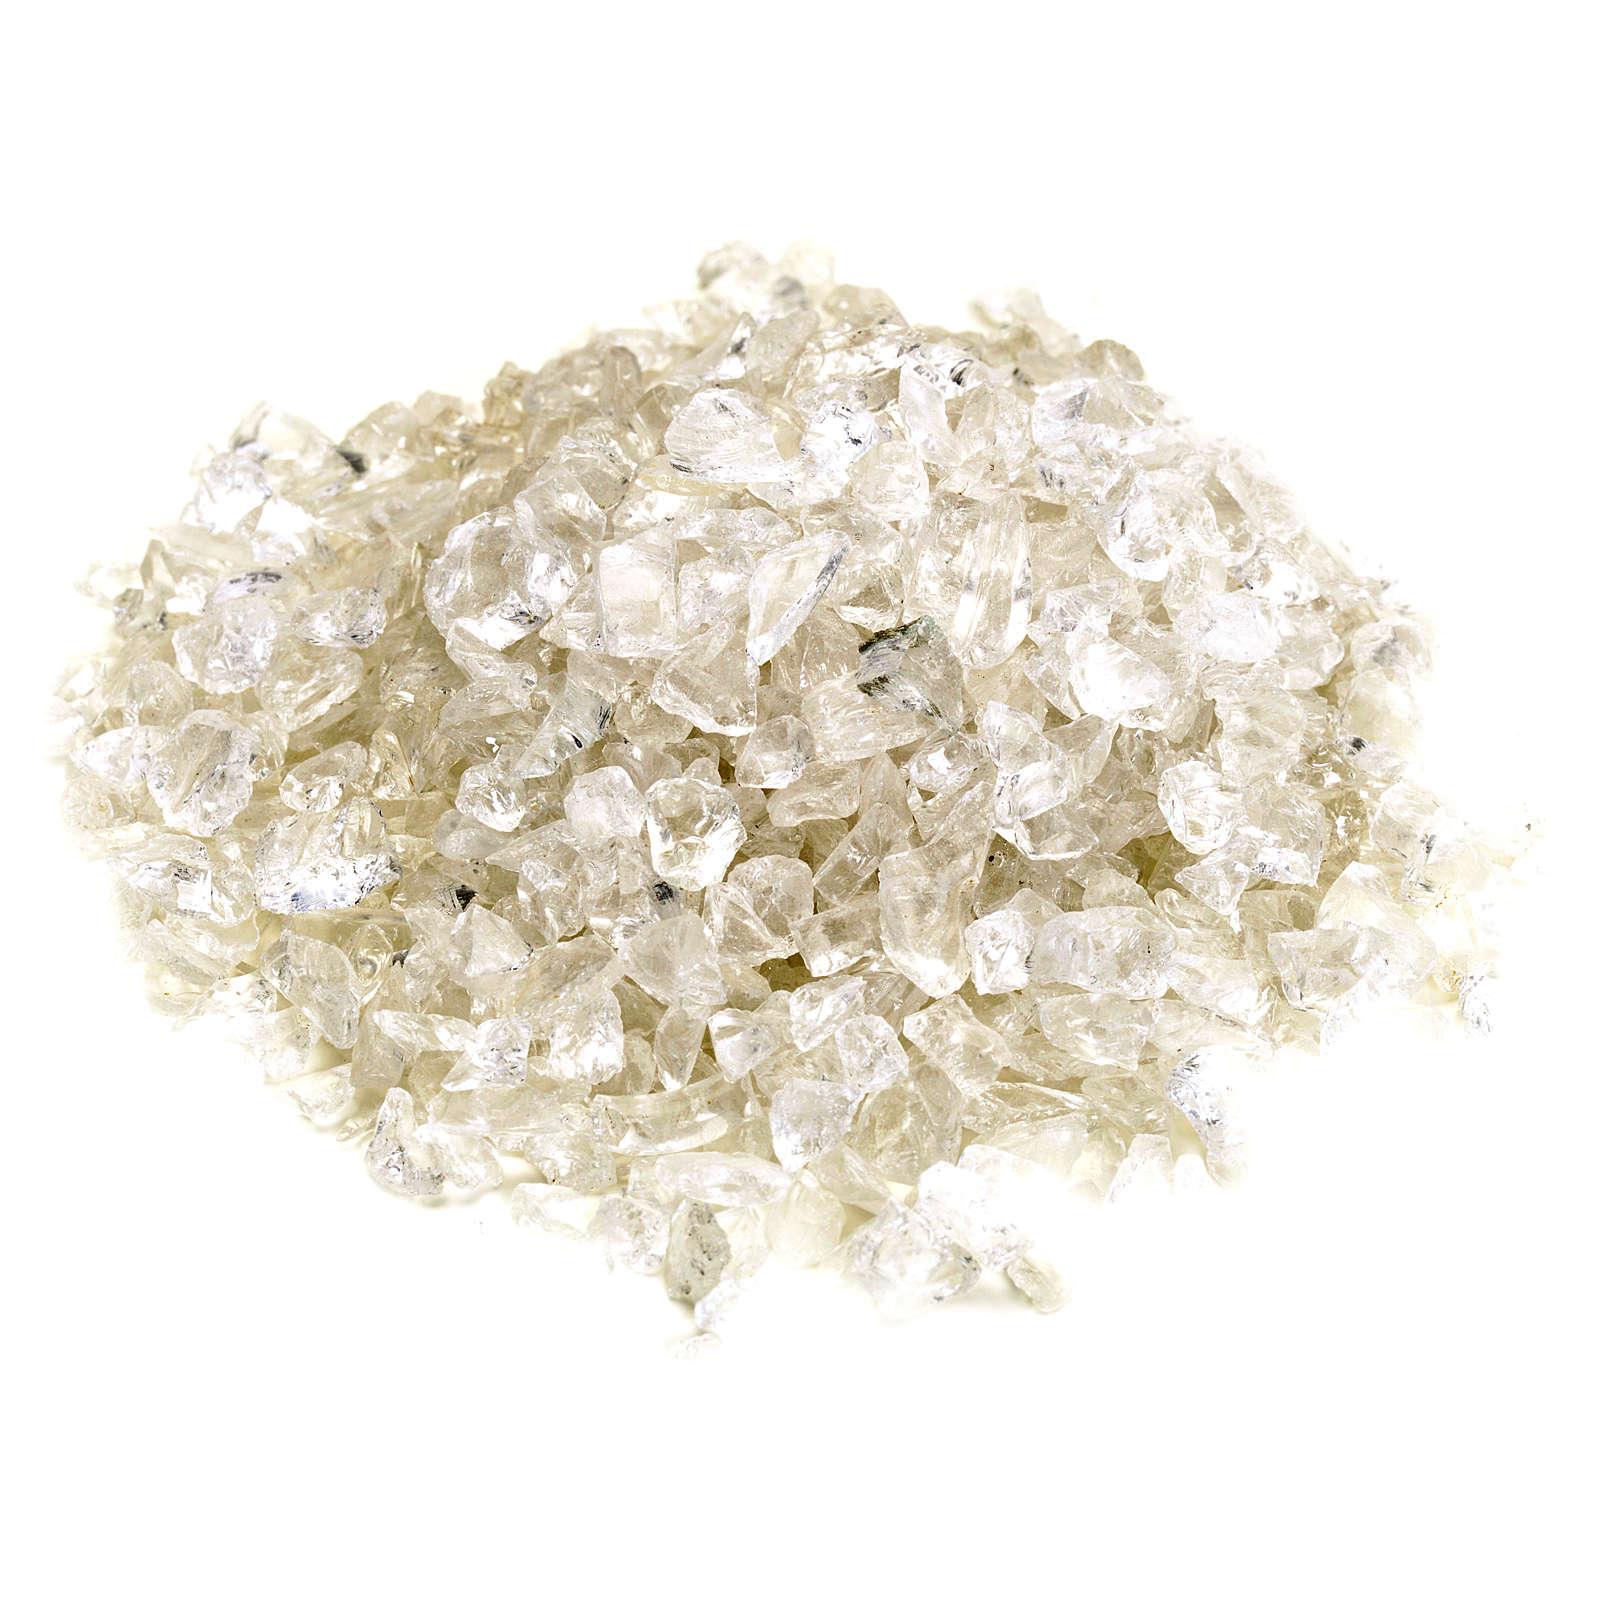 Nativity accessory, grains of gravel for do-it-yourself nativiti 4